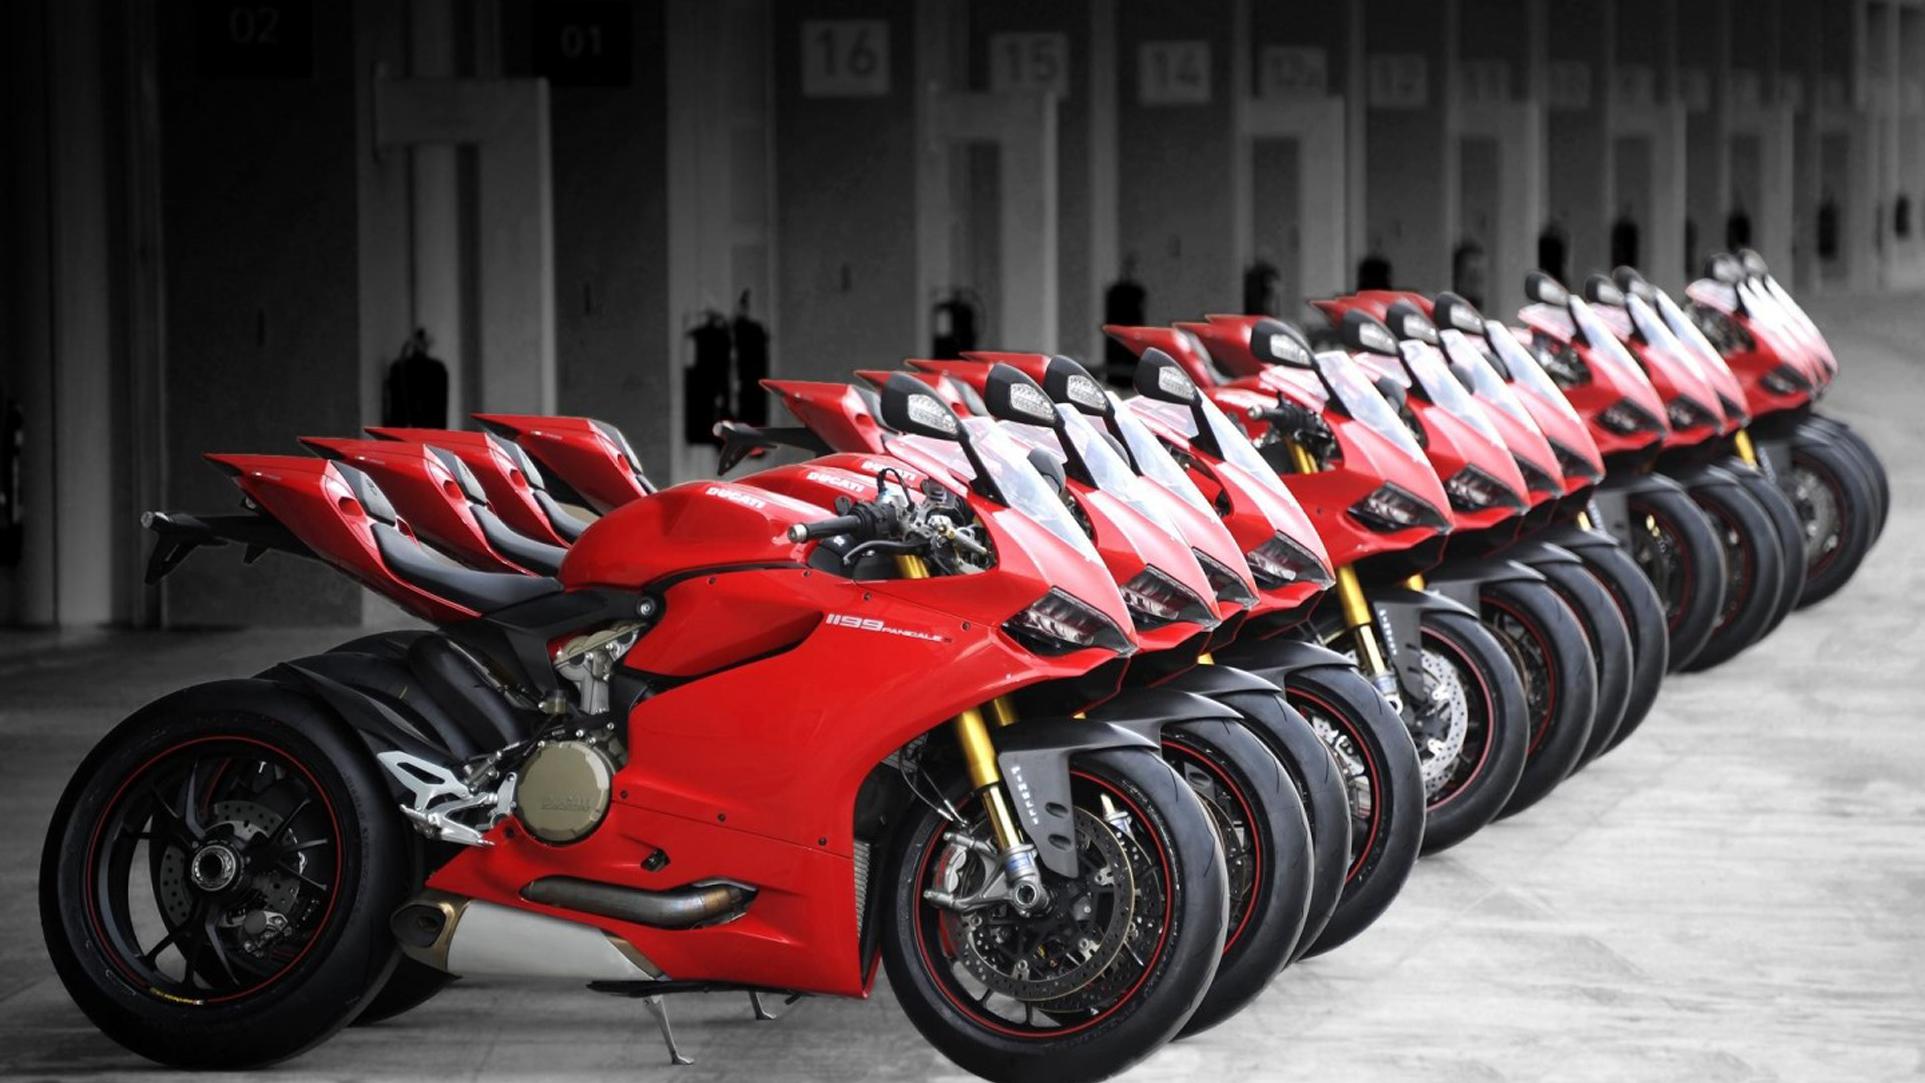 Ducati Wallpapers HD 1925x1083